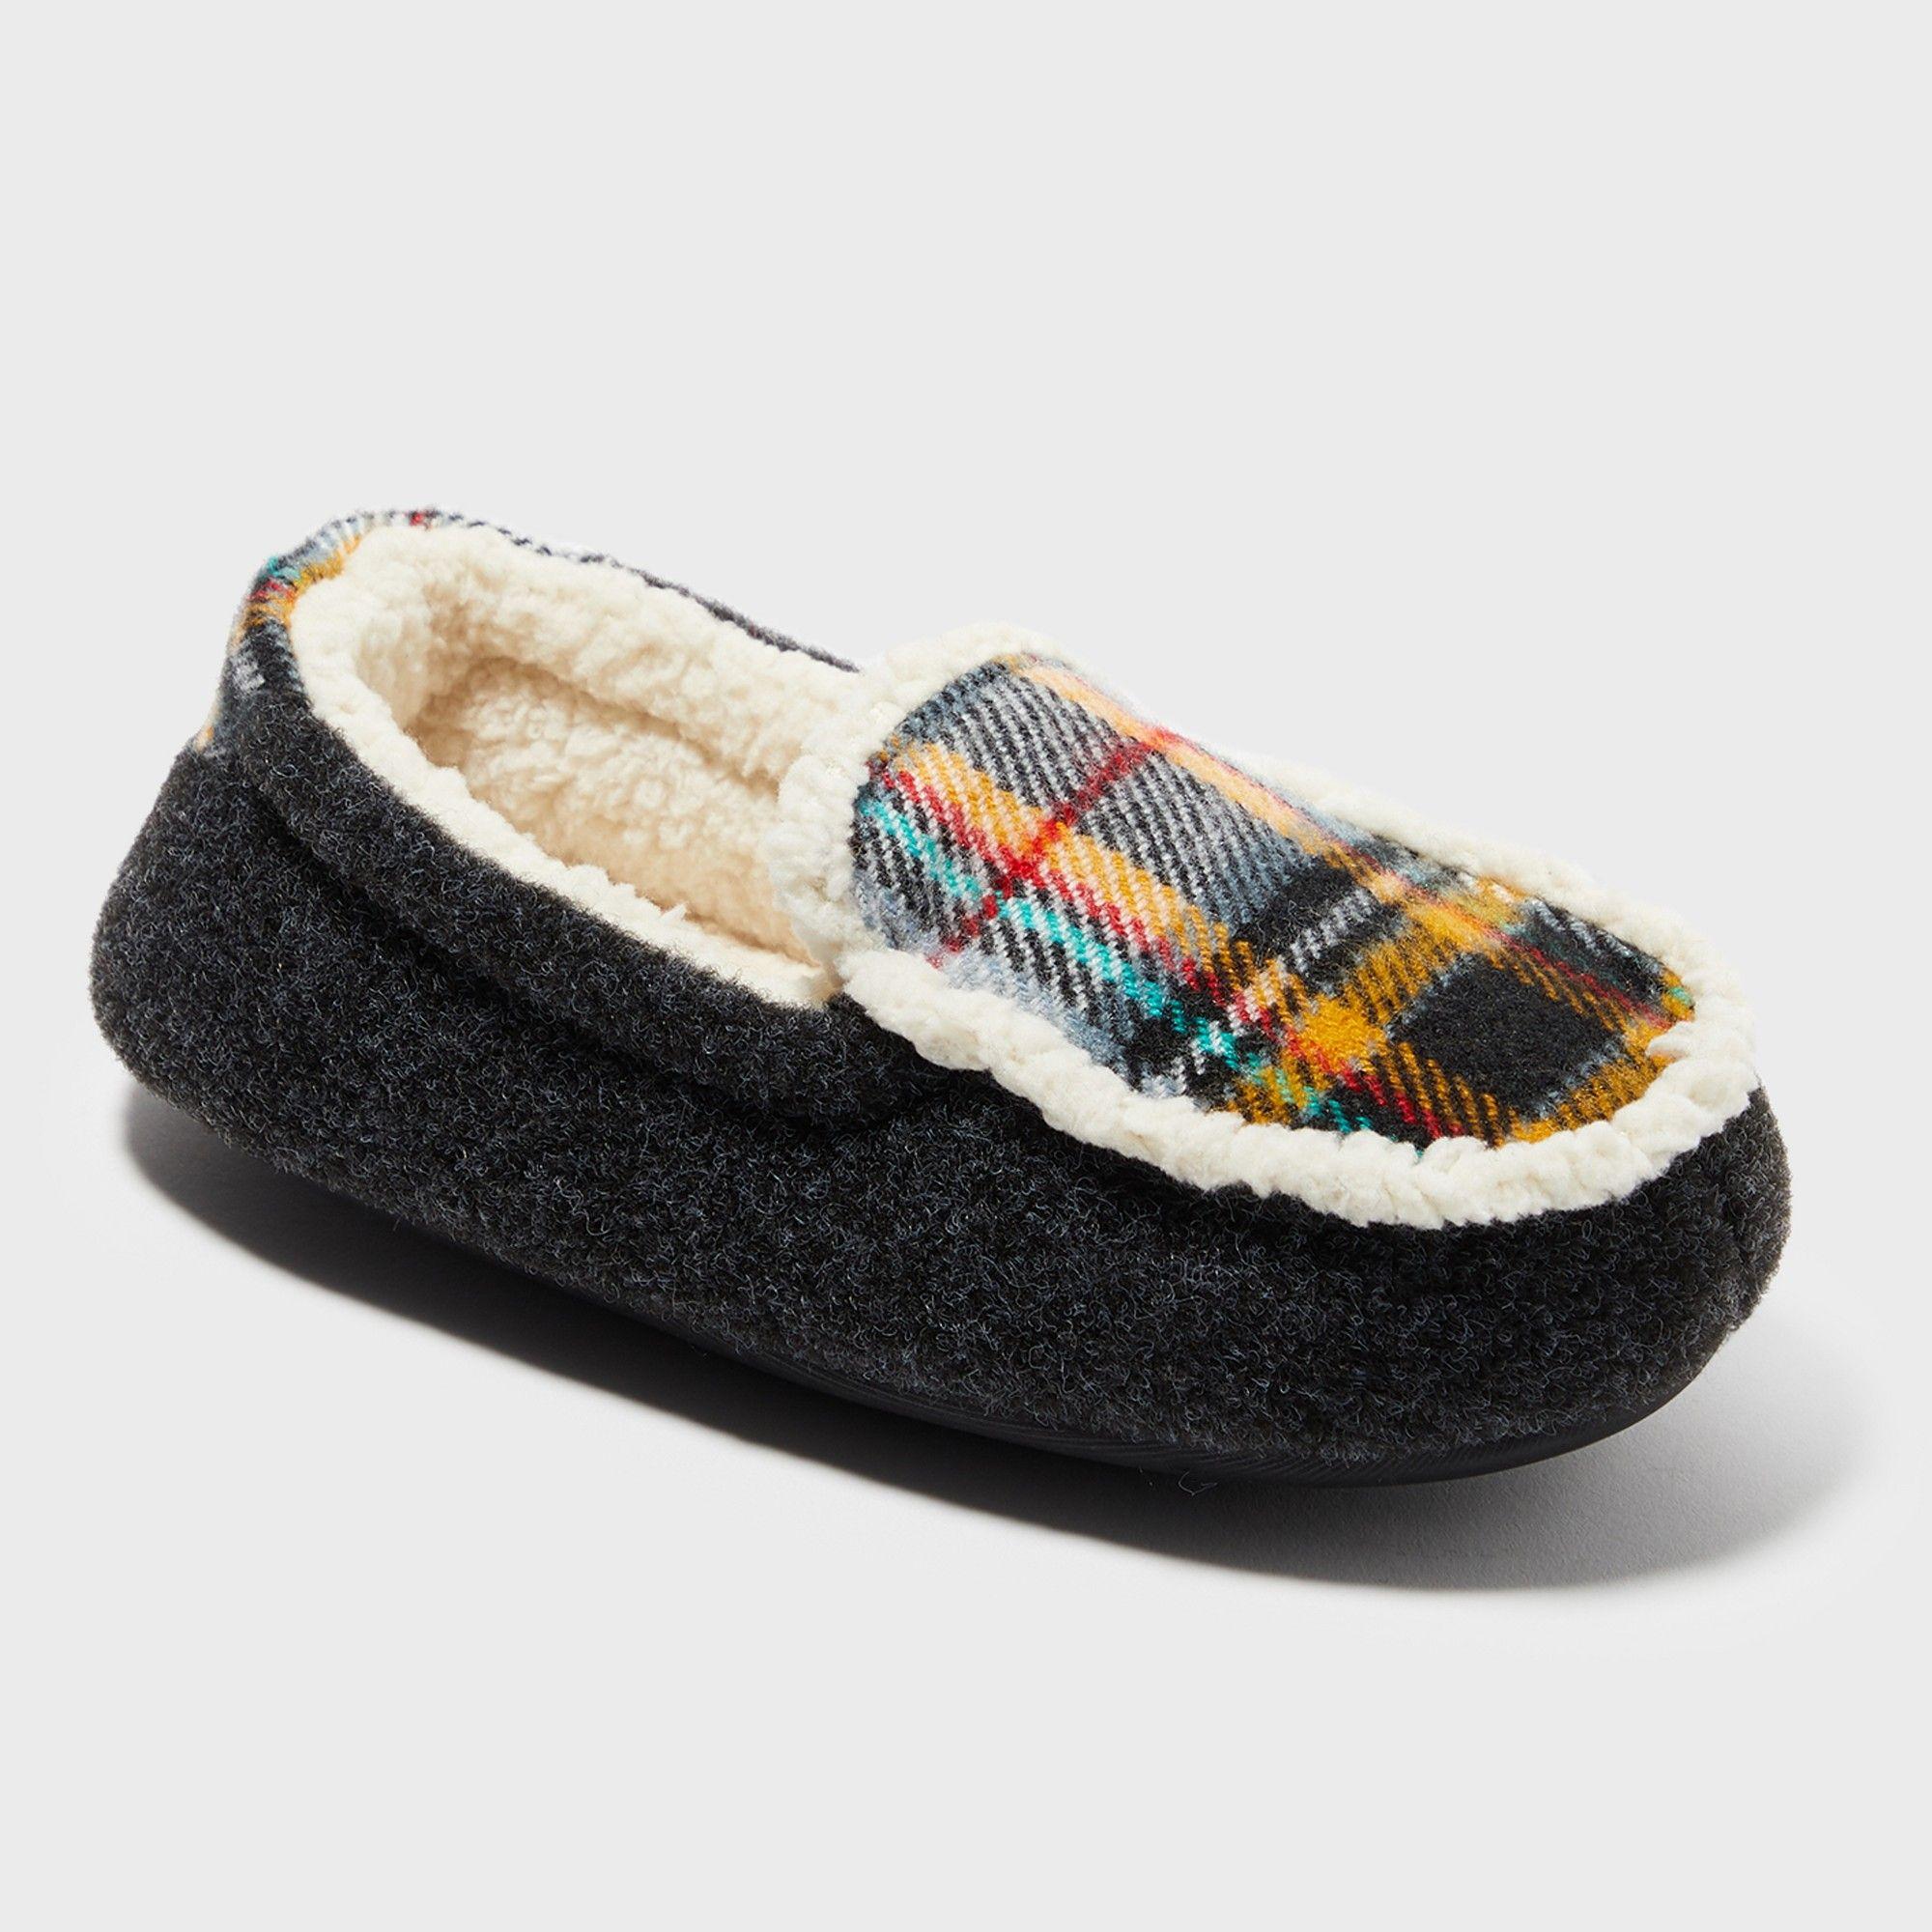 55615a6f6e94 Toddler Boys  Phillip Sherpa Lined Slipper - Cat   Jack™ Brown. Boys   Dearfoams Moccasin Slippers - Black 11-12